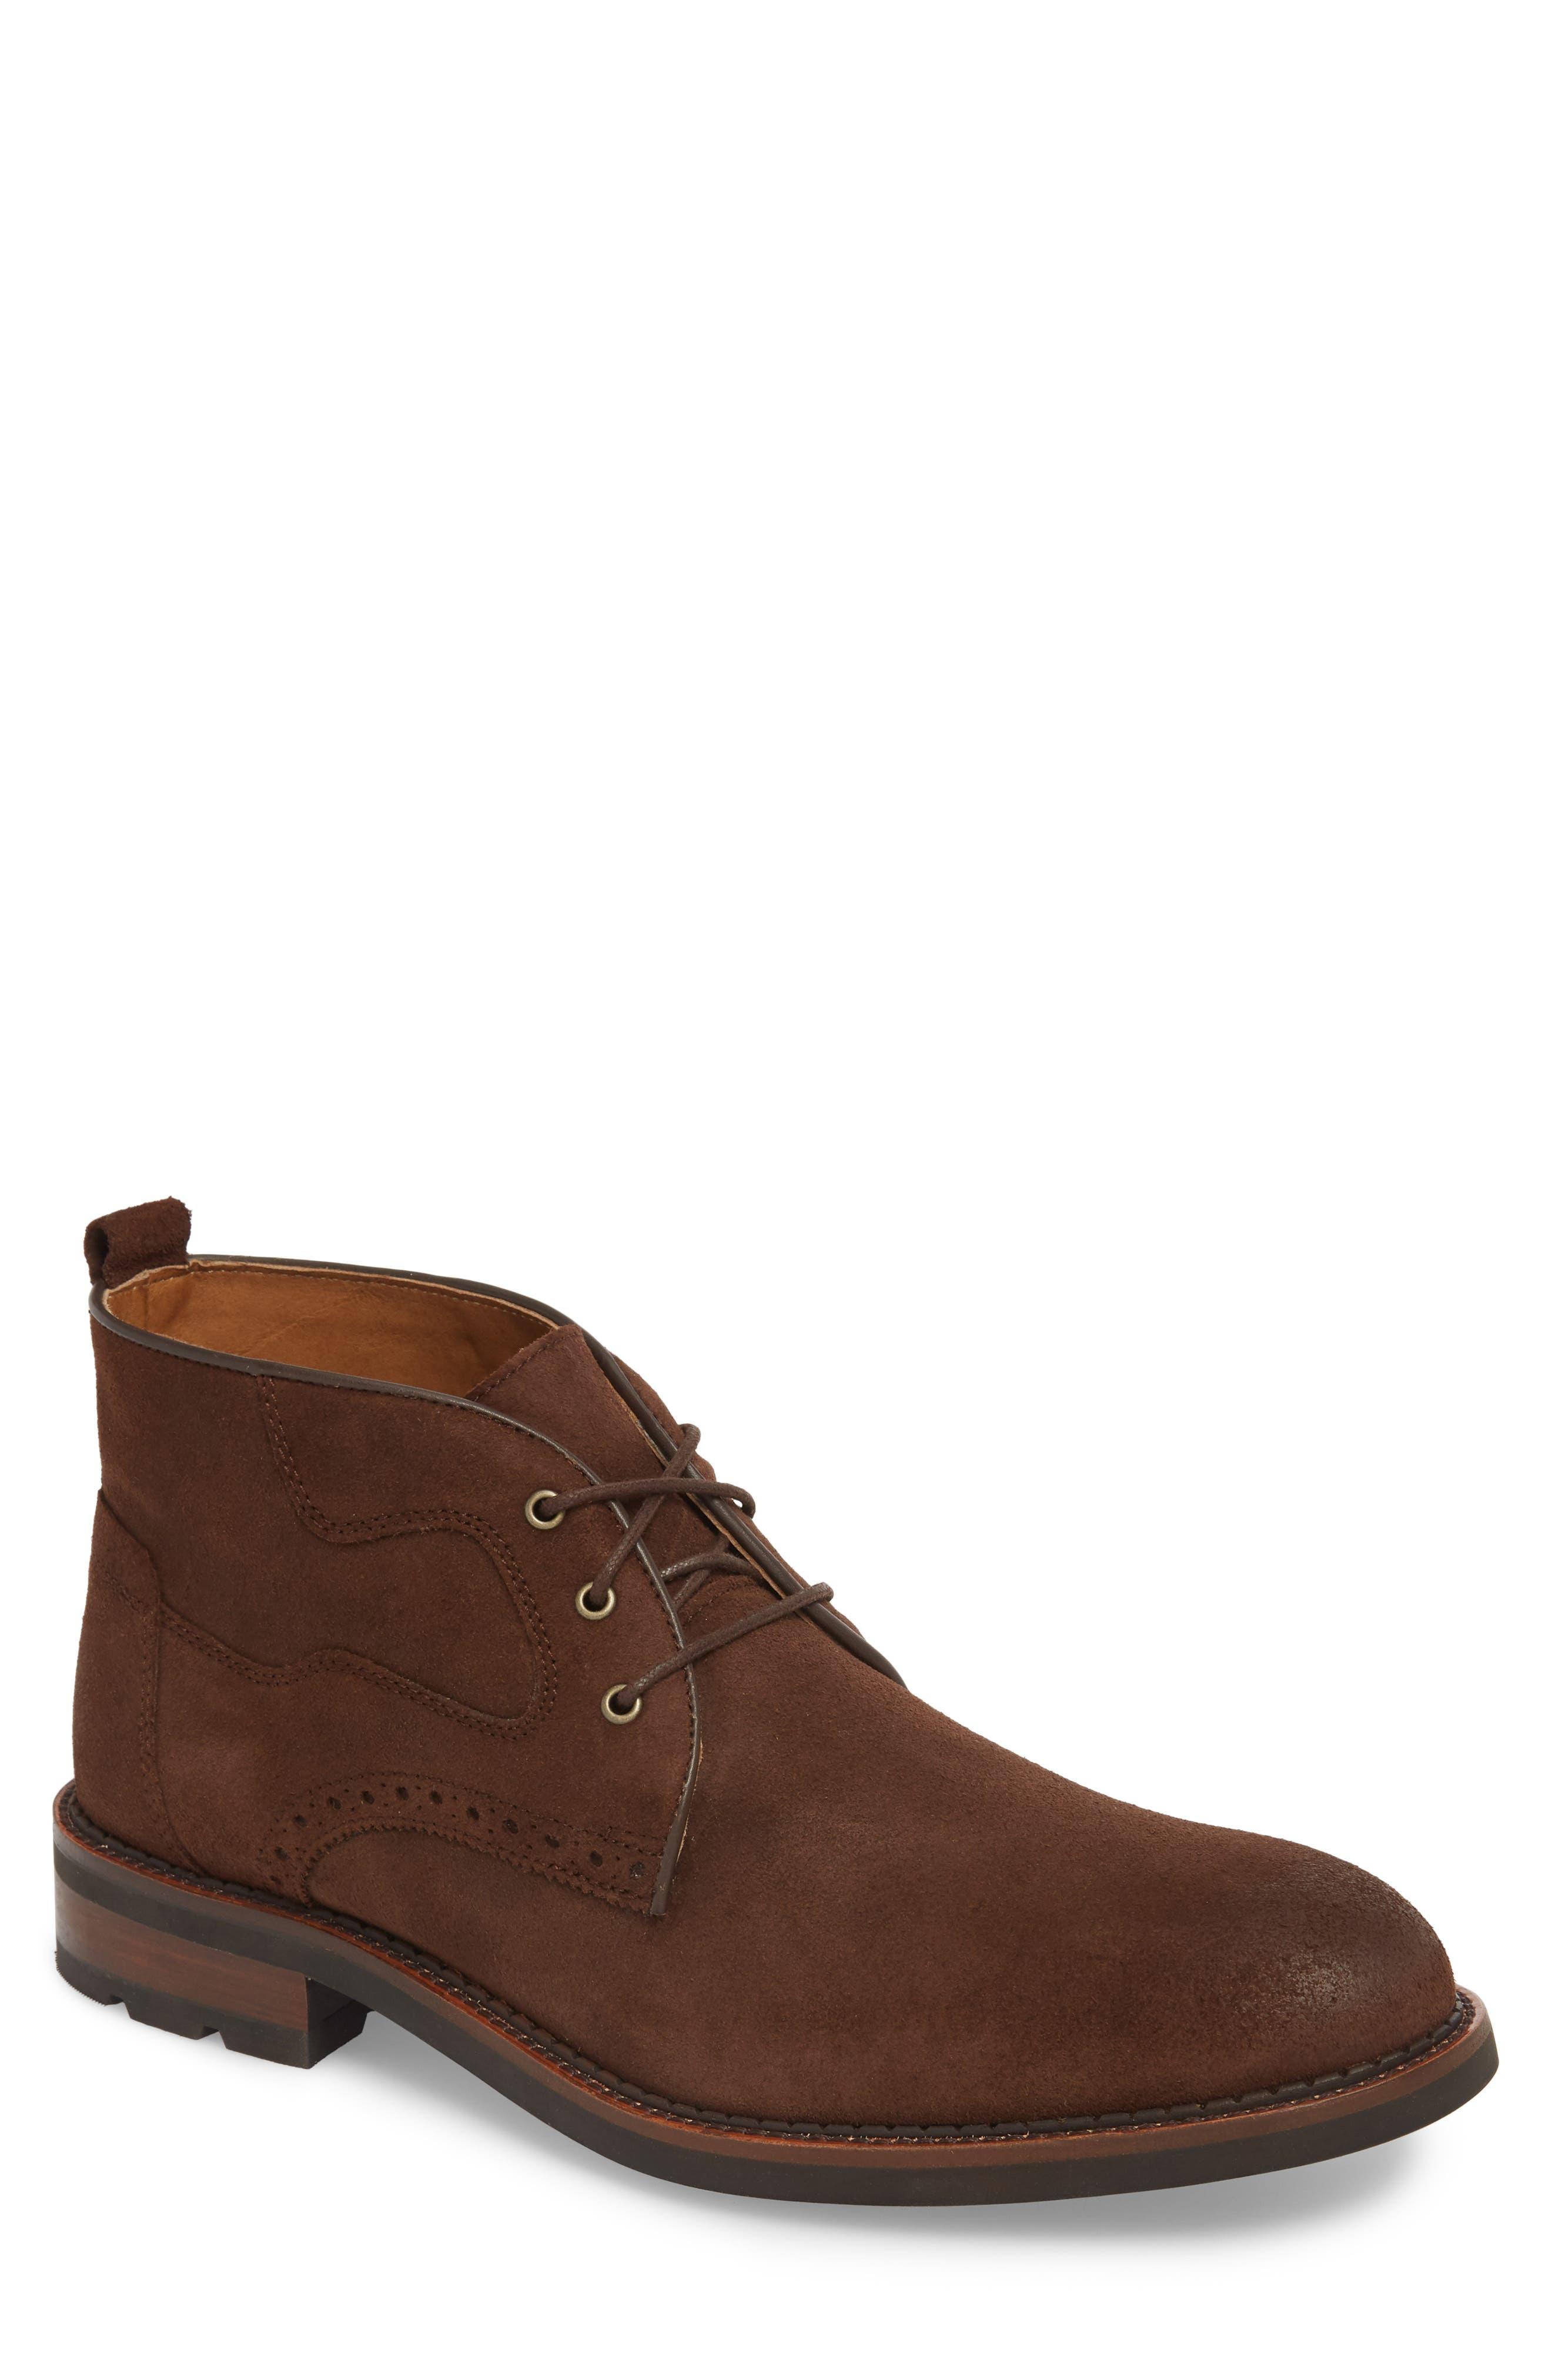 J & m 1850 Fullerton Chukka Boot, Brown